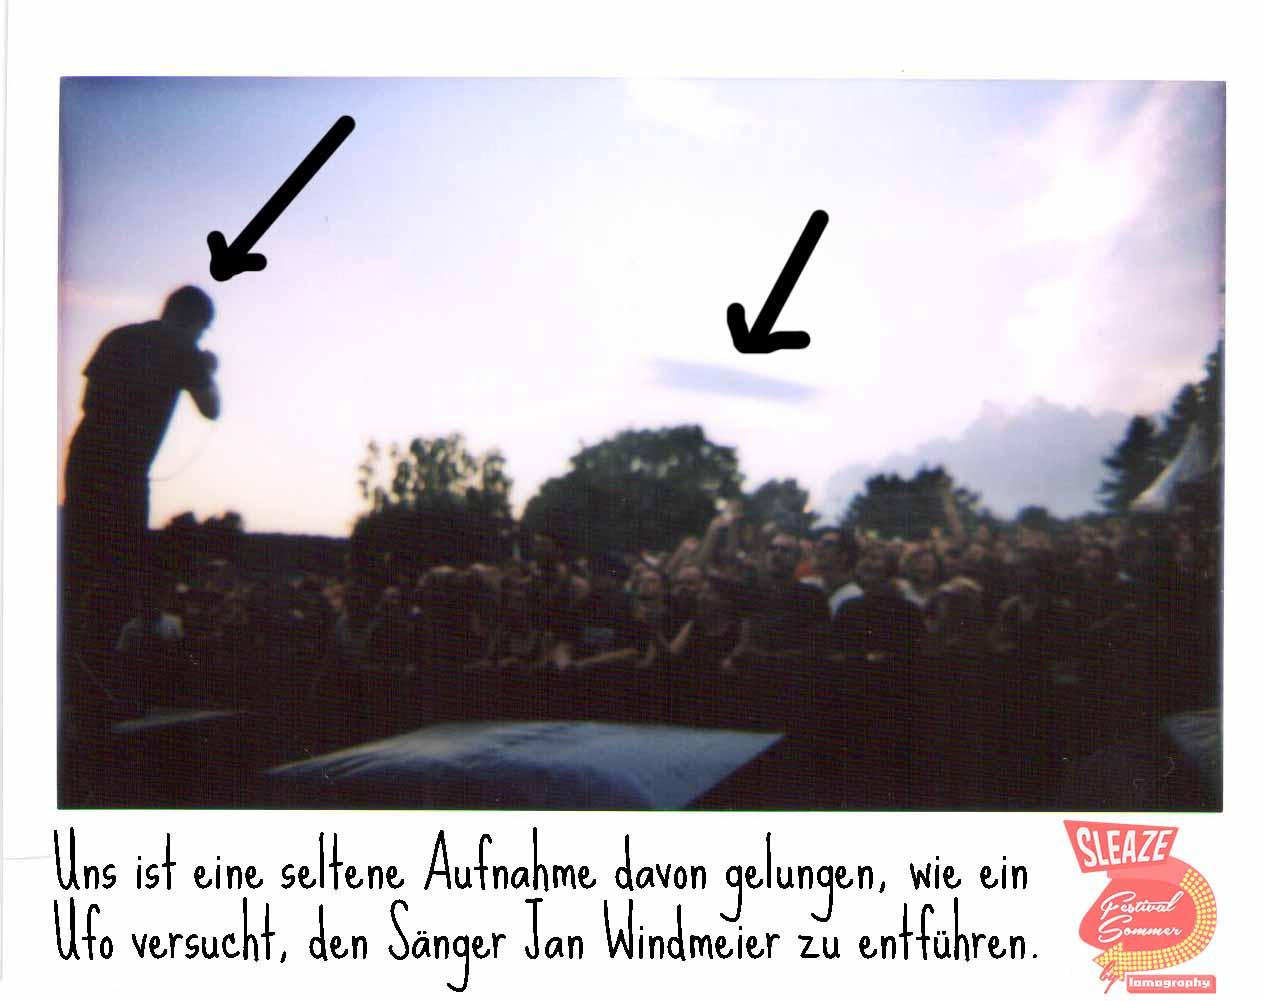 Der SLEAZE Festivalsommer by Lomography Teil 1 mit Ufo